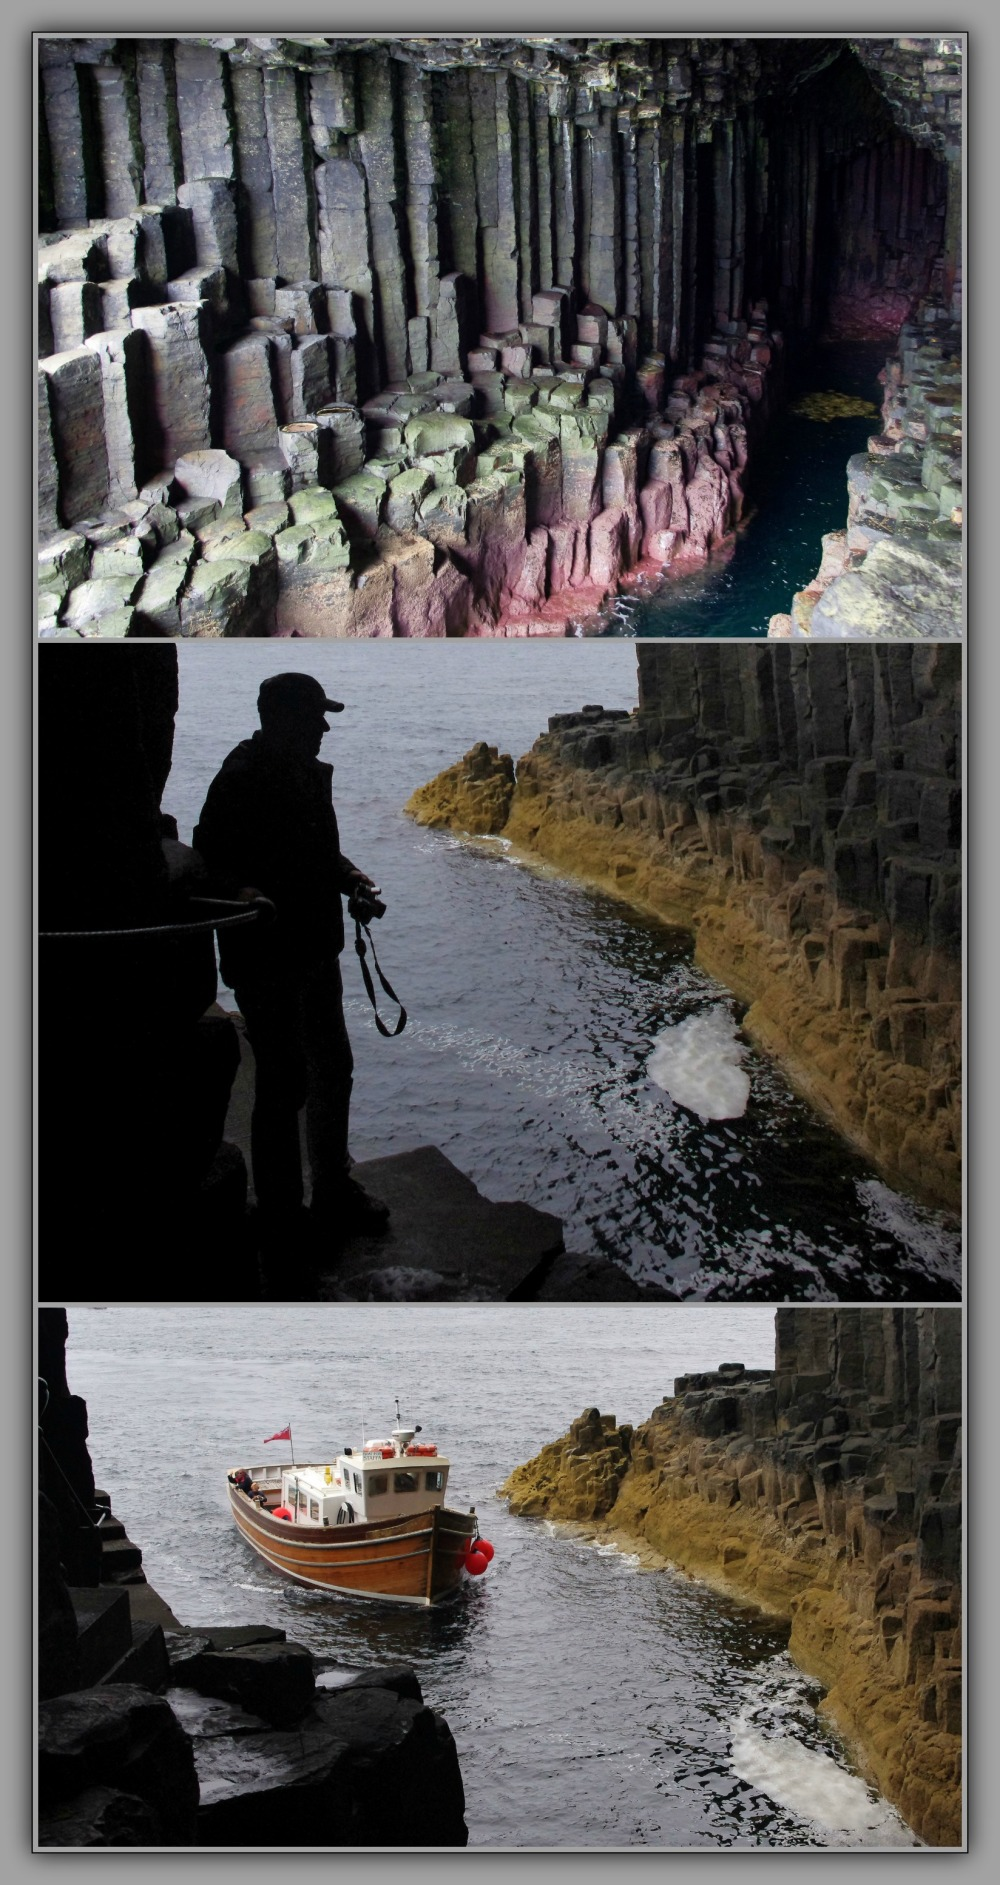 scotland, staffa, fingal's cave, triptych